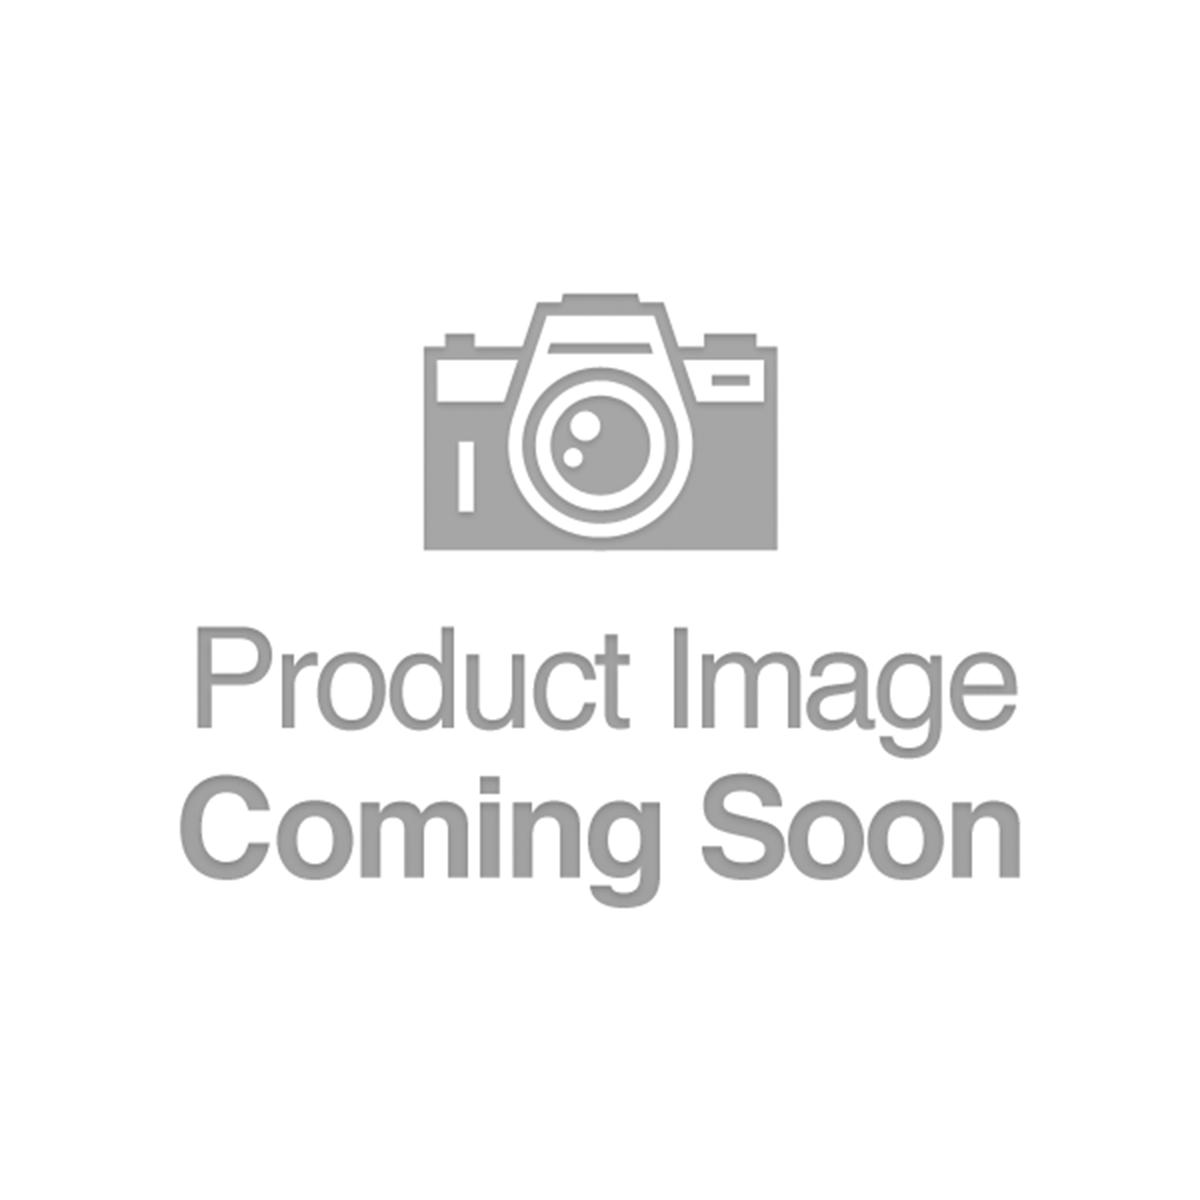 Memphis - Tennessee - CH 336 - FR 689 - PCGS 63 PPQ